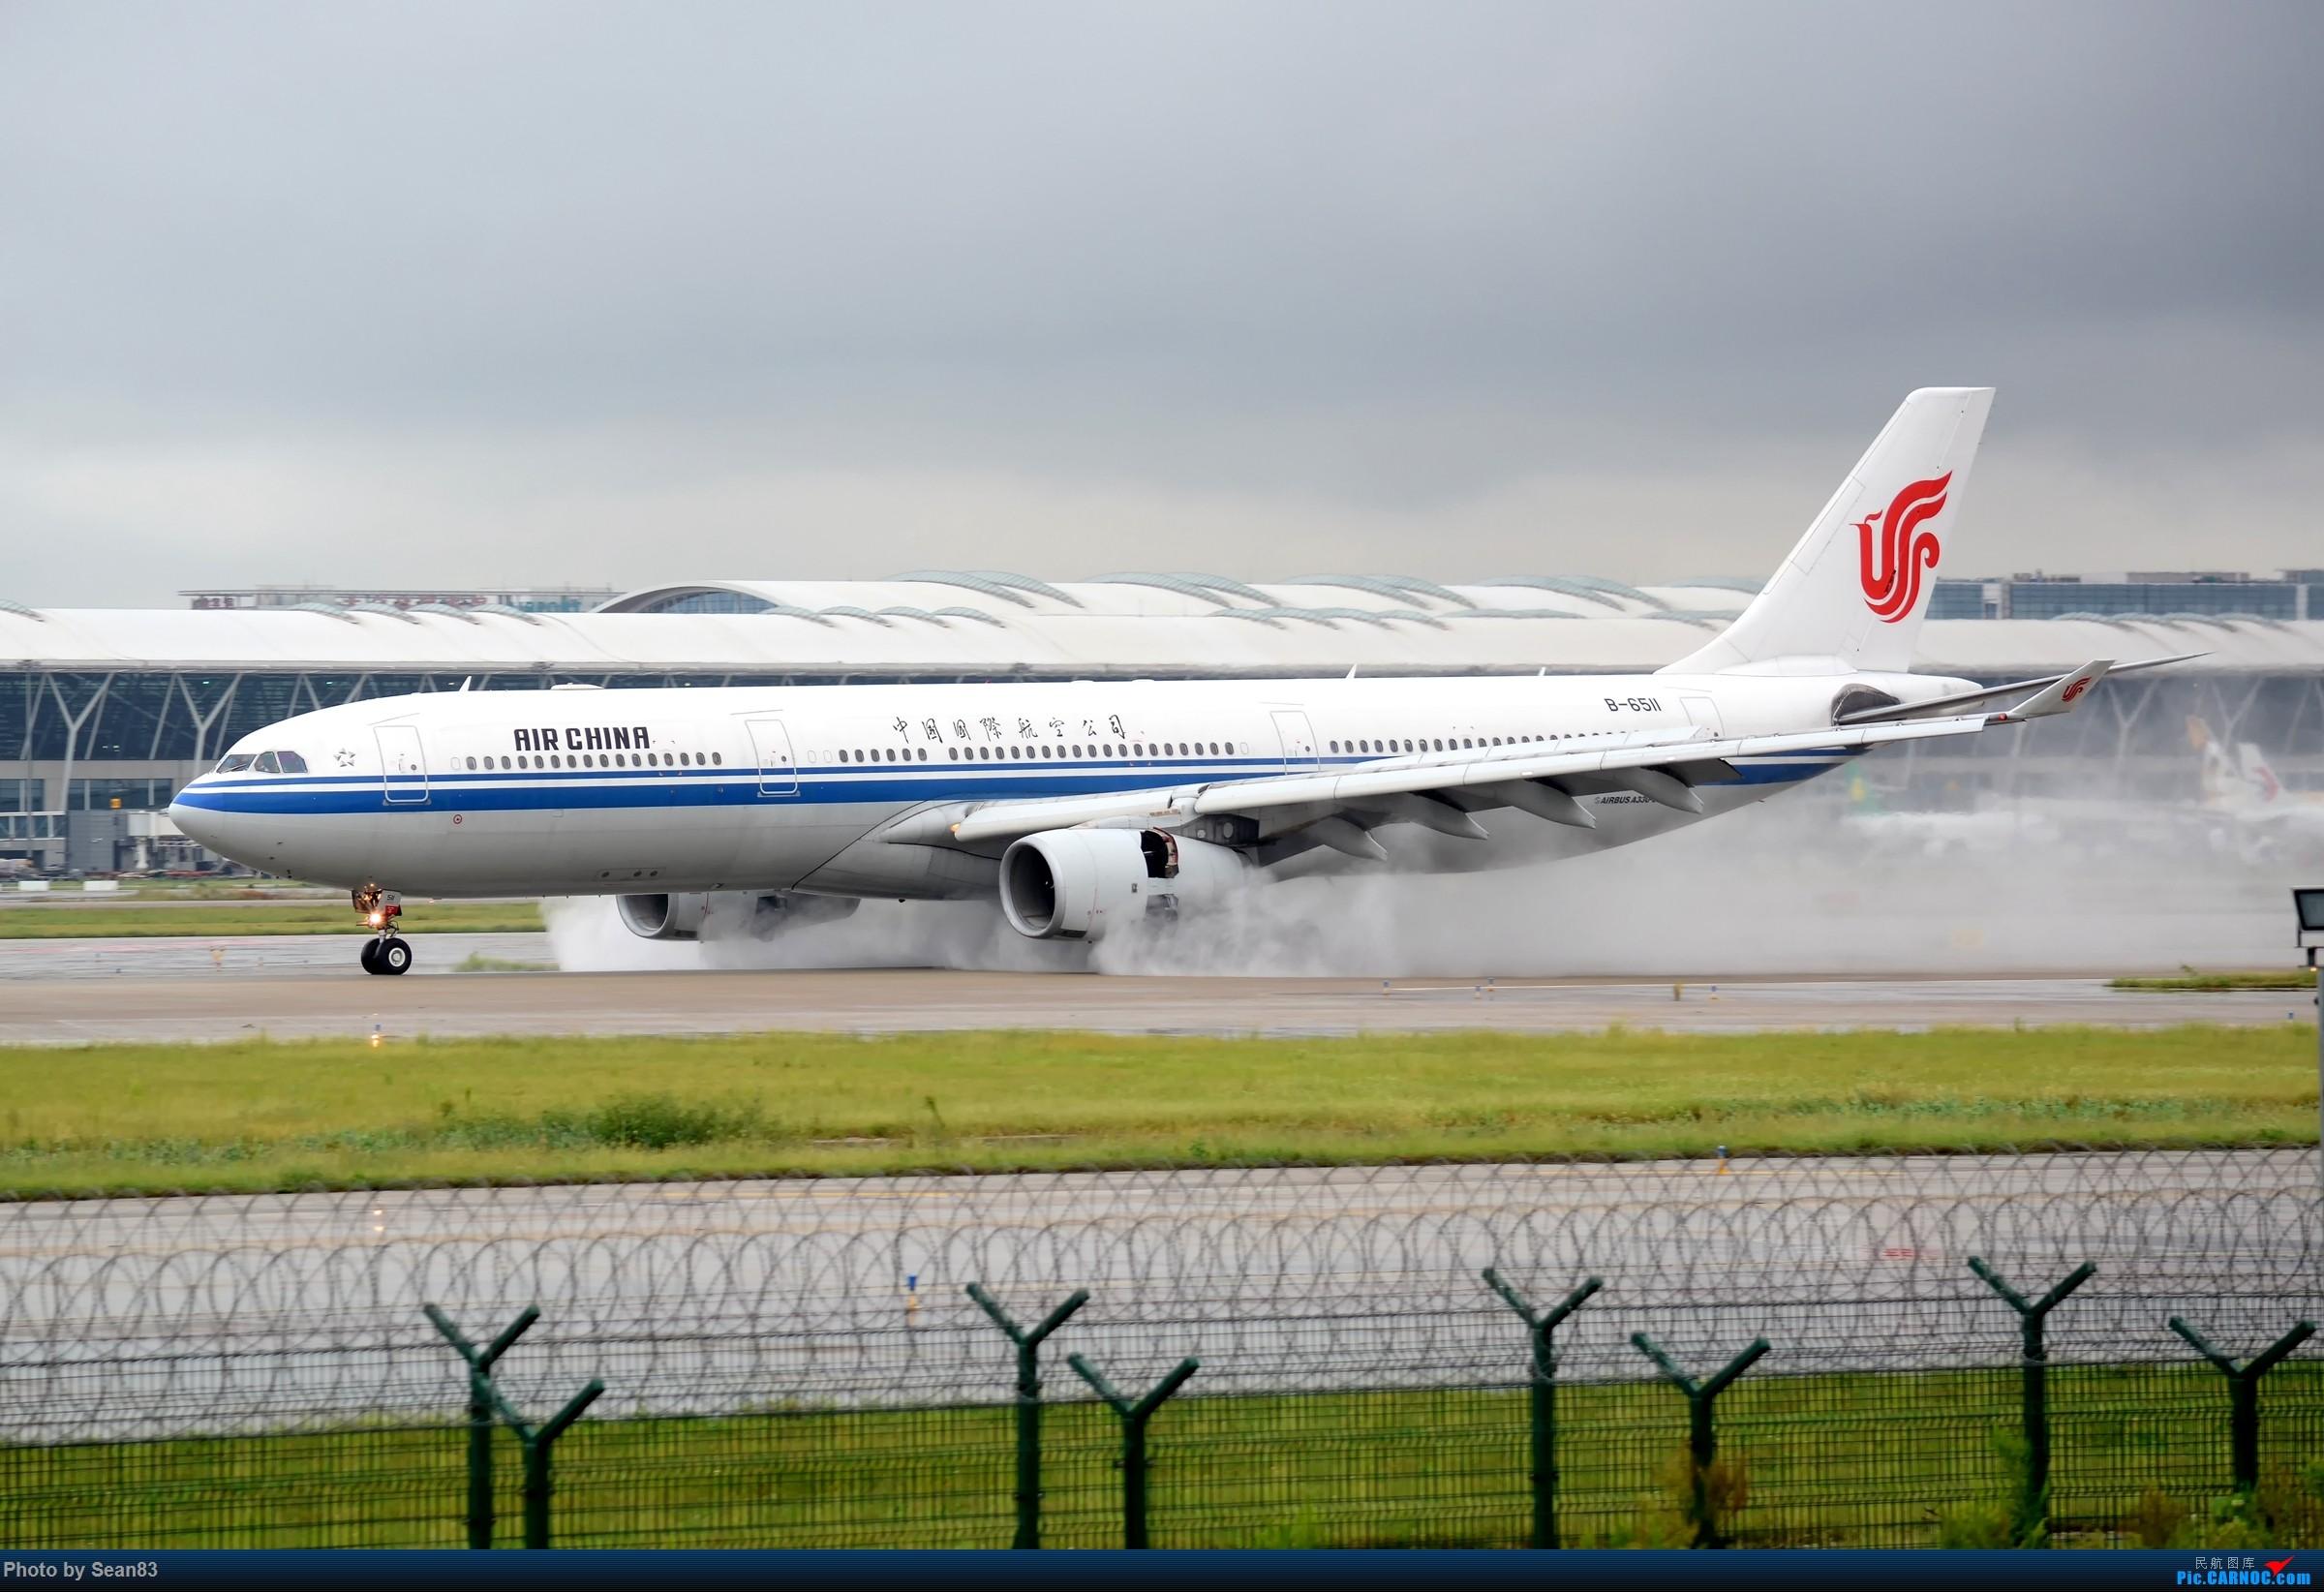 Re:[原创]尊老爱幼,海纳百川是中华民族的传统美德 AIRBUS A330-300 B-6511 中国上海浦东国际机场